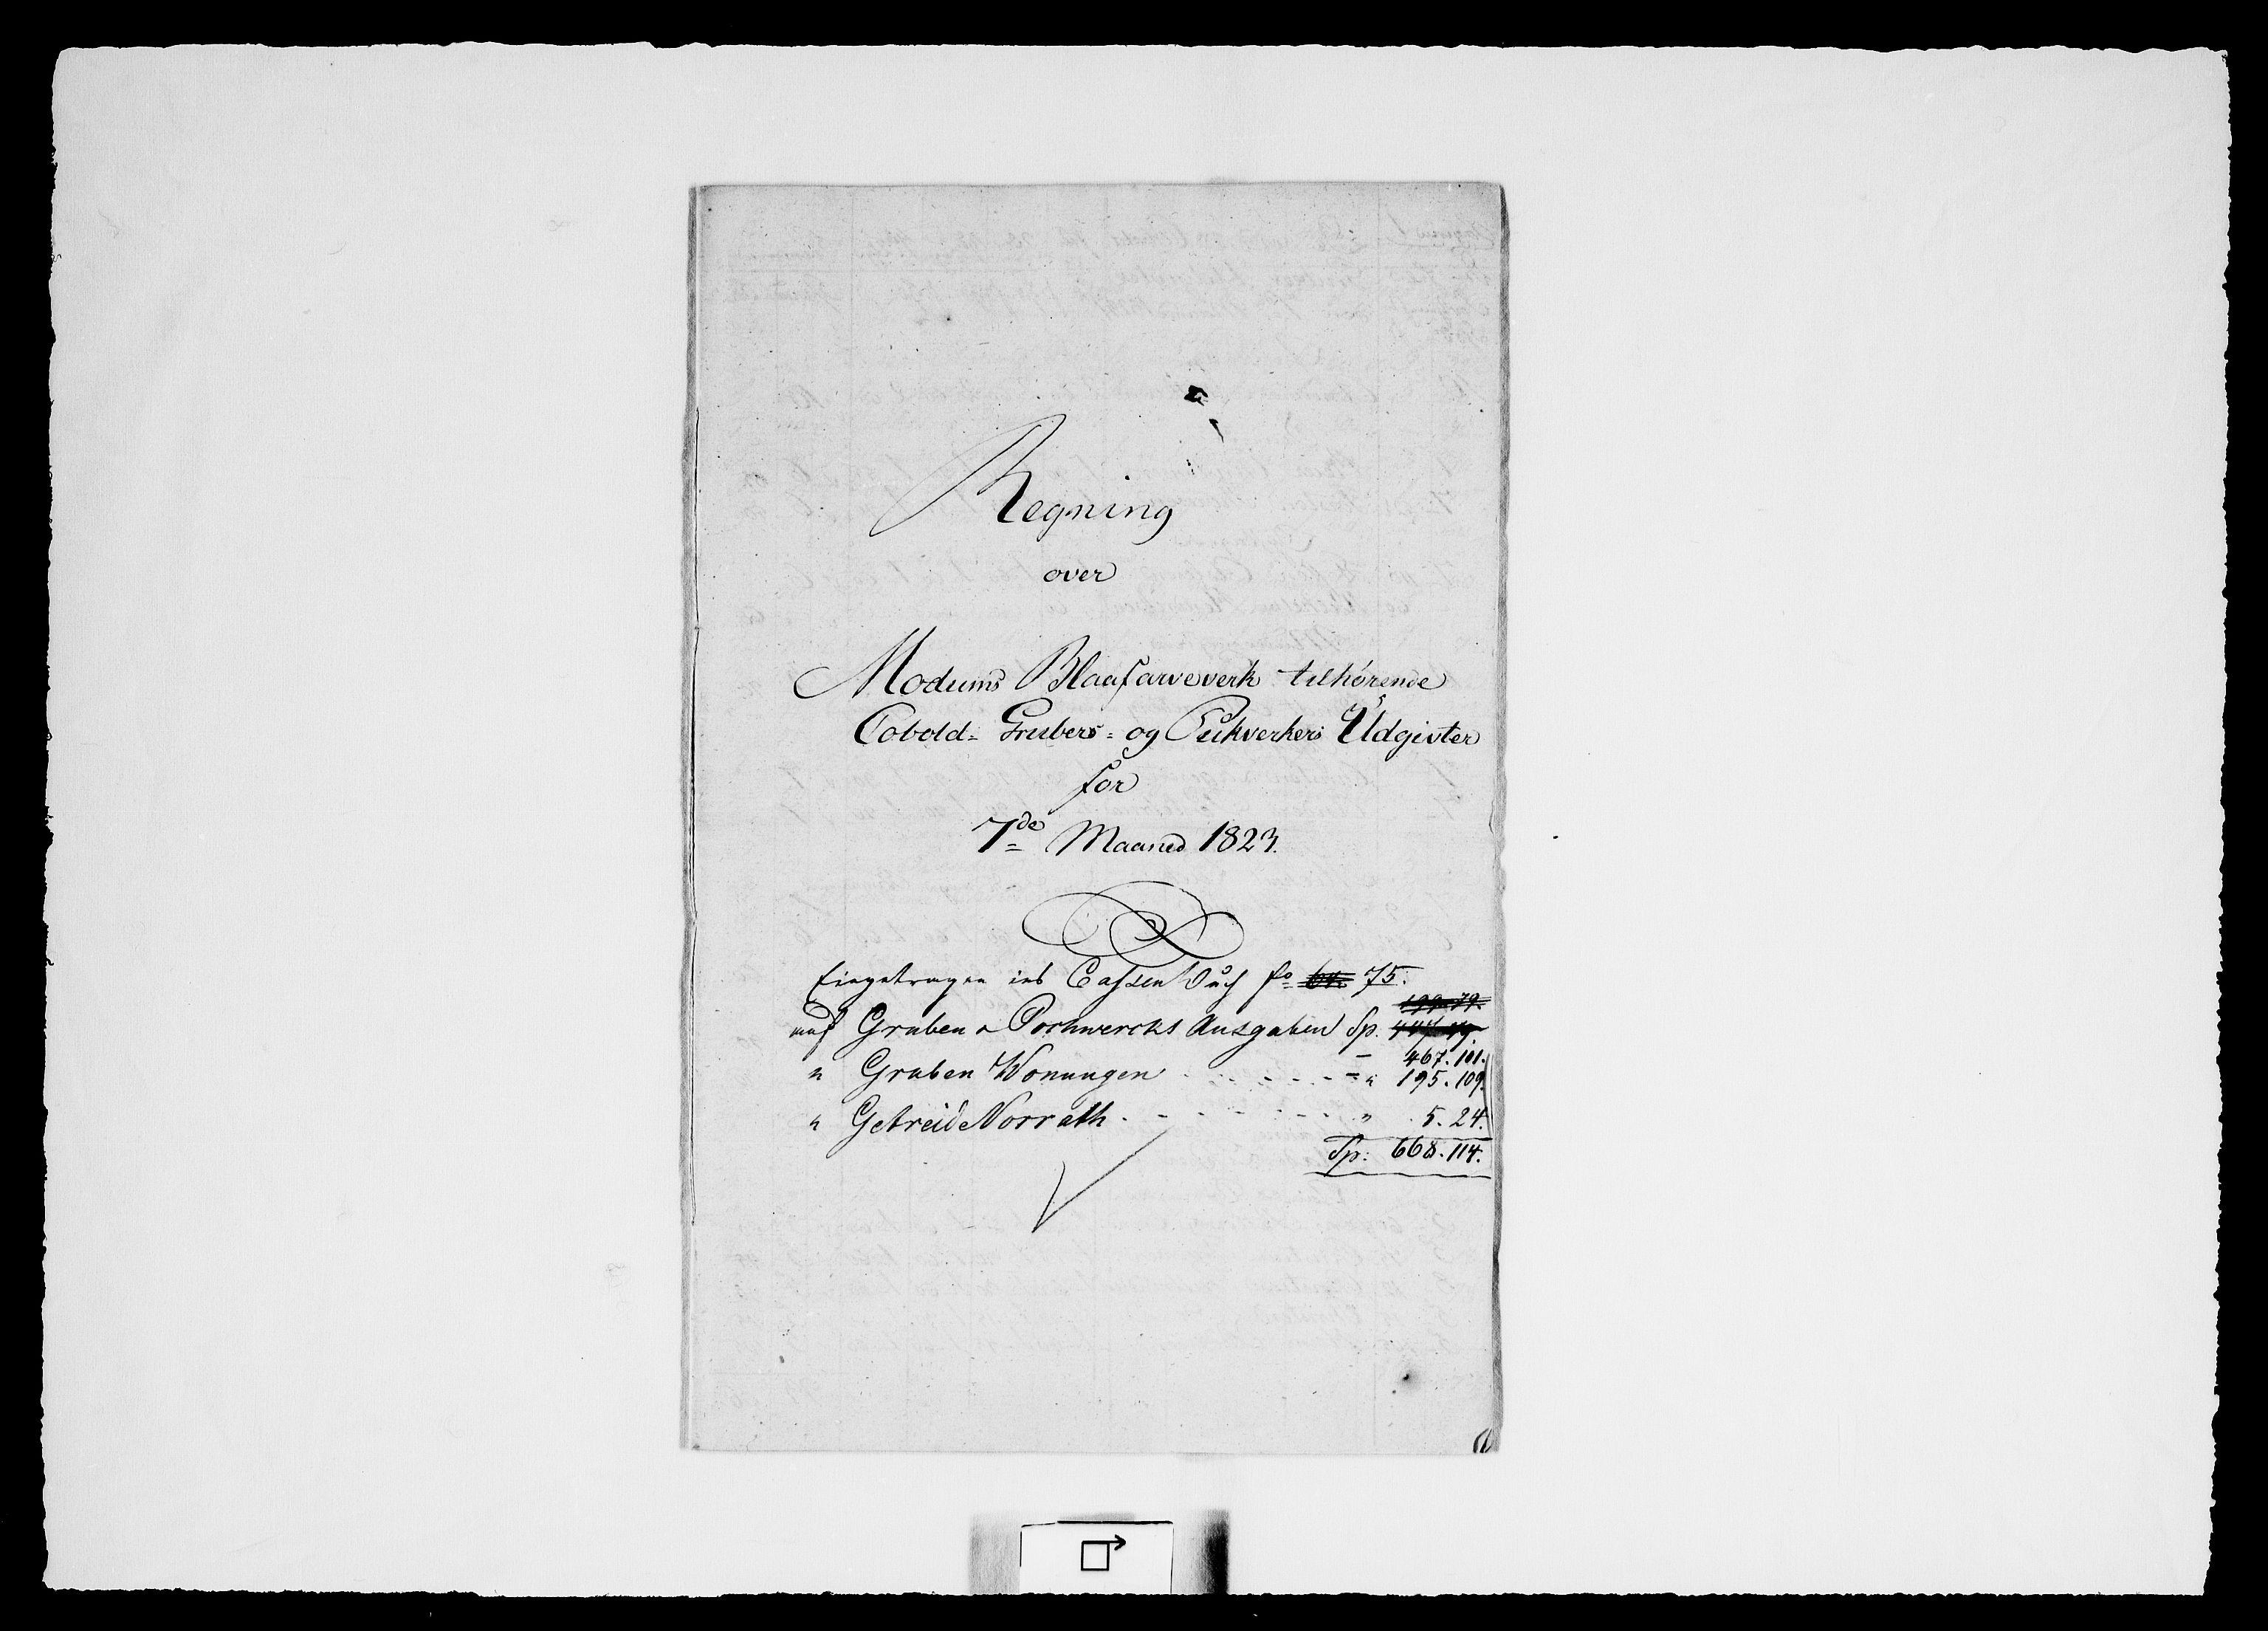 RA, Modums Blaafarveværk, G/Gd/Gdd/L0255, 1823-1826, s. 2